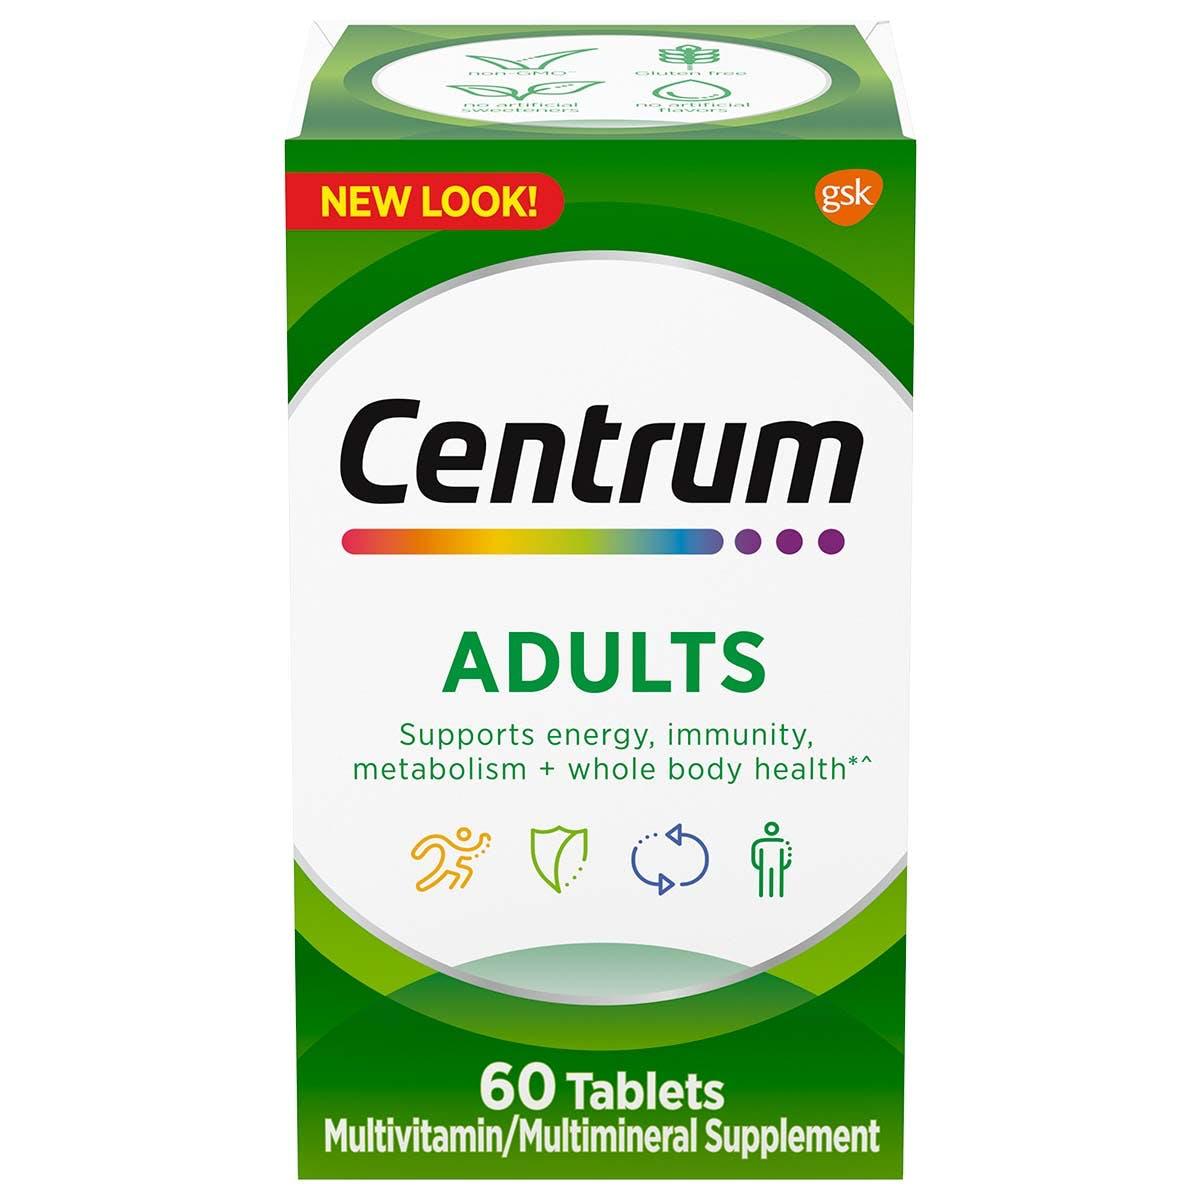 Box of Centrum Adults multivitamins